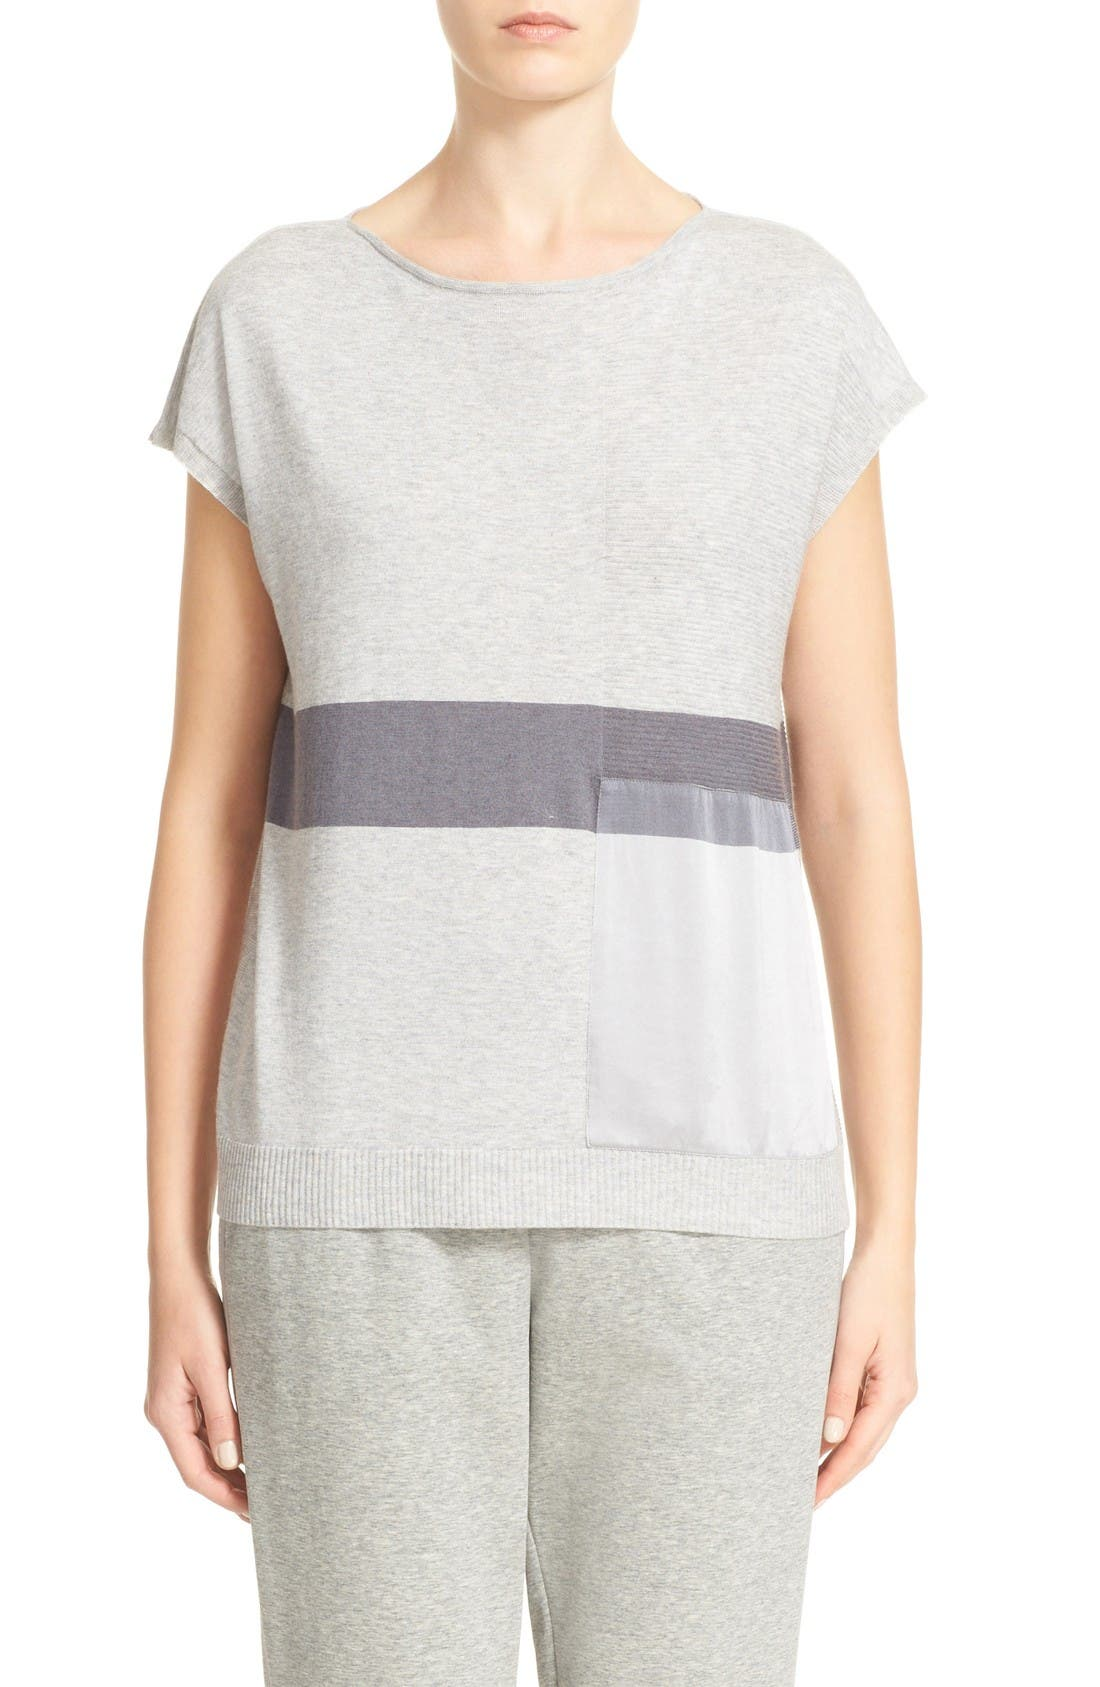 LAFAYETTE 148 NEW YORK Silk Trim Sweater